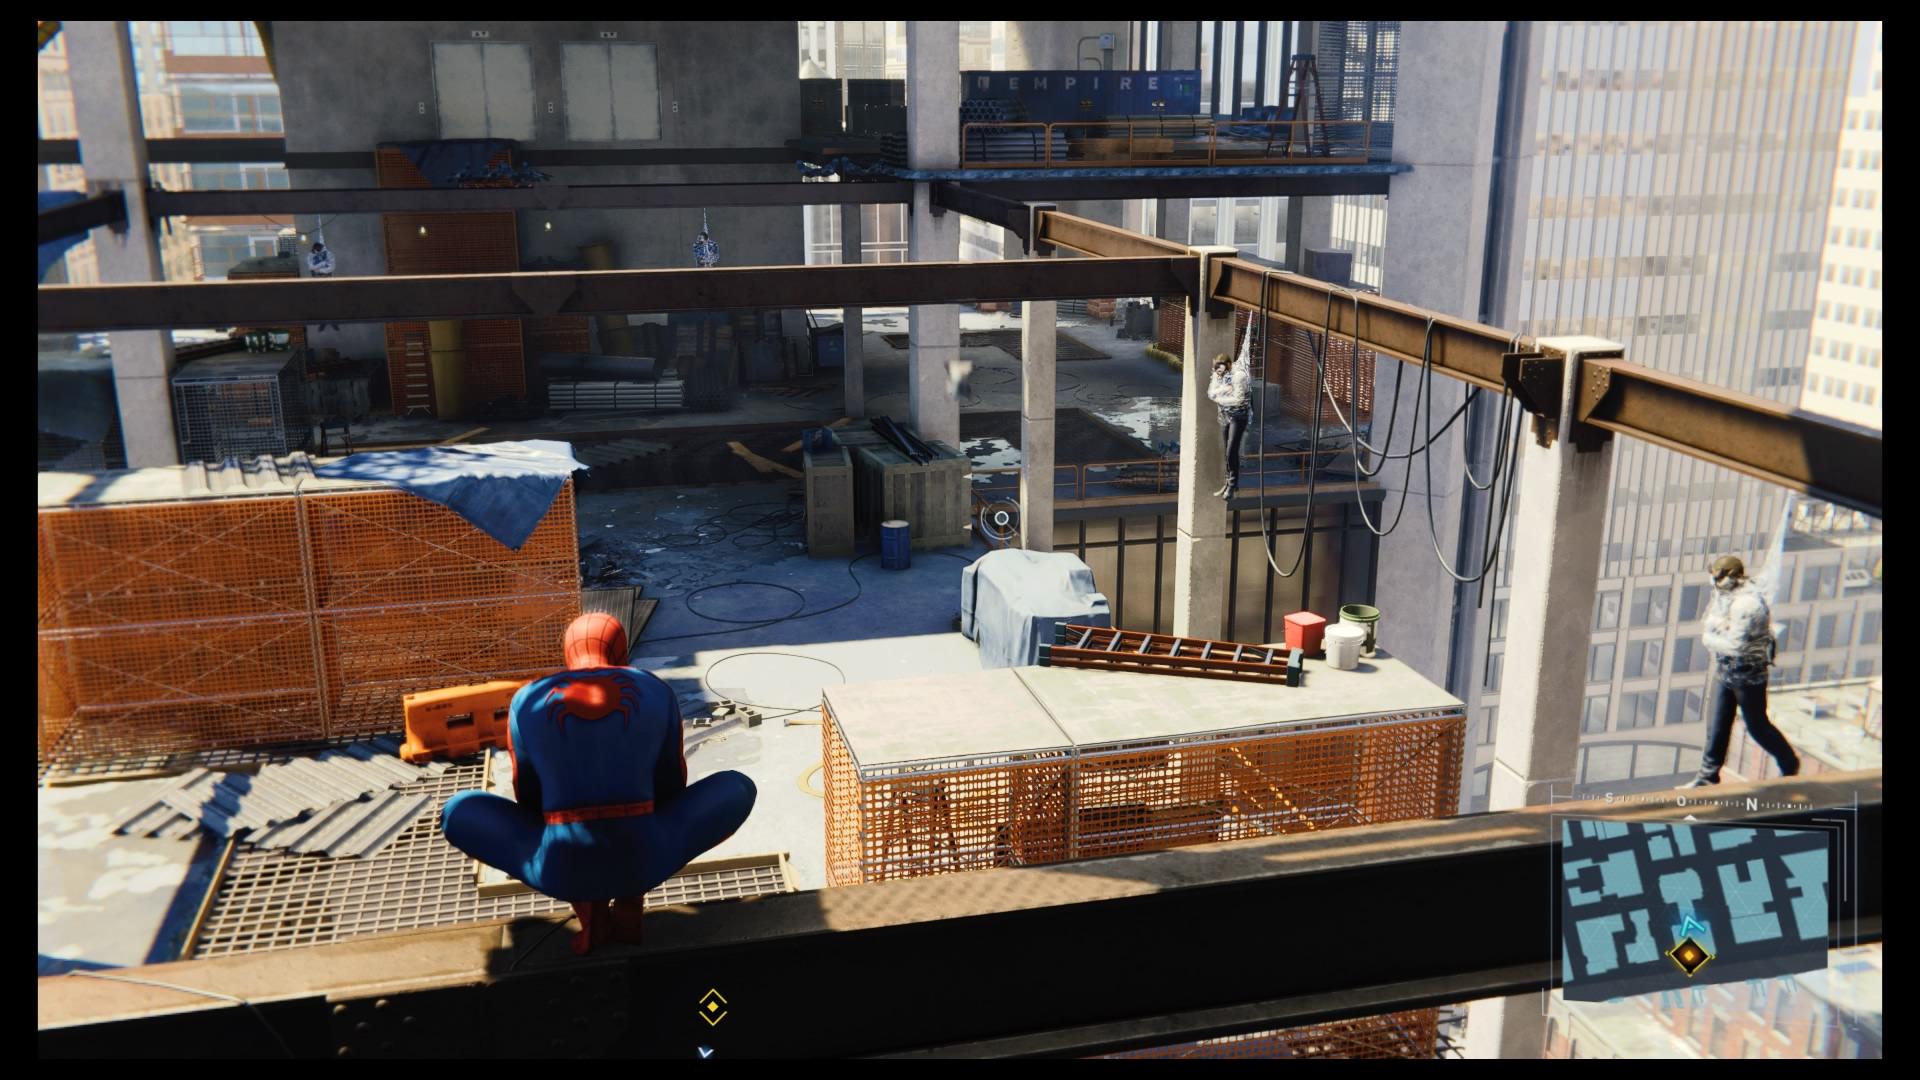 marvel_s_spider-man_20181009085437.jpg